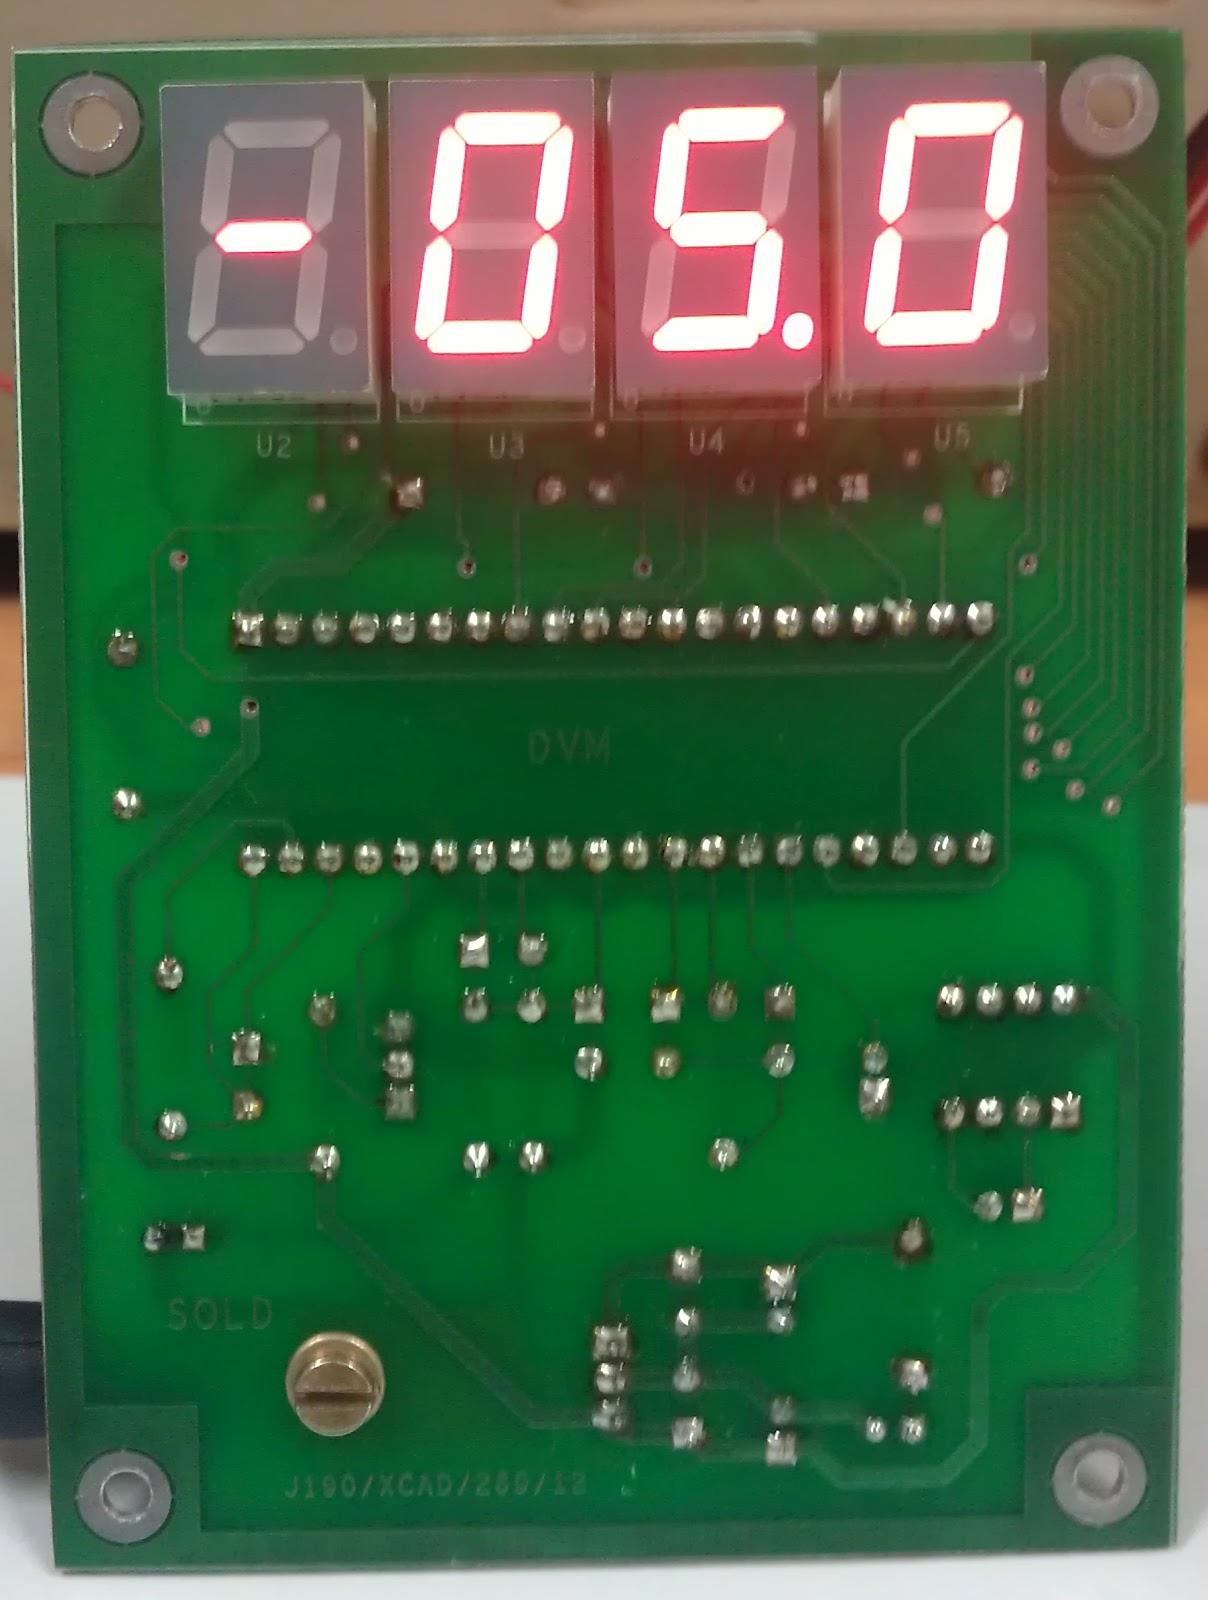 Ham Radio Mipl 2012 Icl7107 Digital Led Voltmeter Electronics Circuit Picture Hd Walls Dvm Displaying Negative Voltage